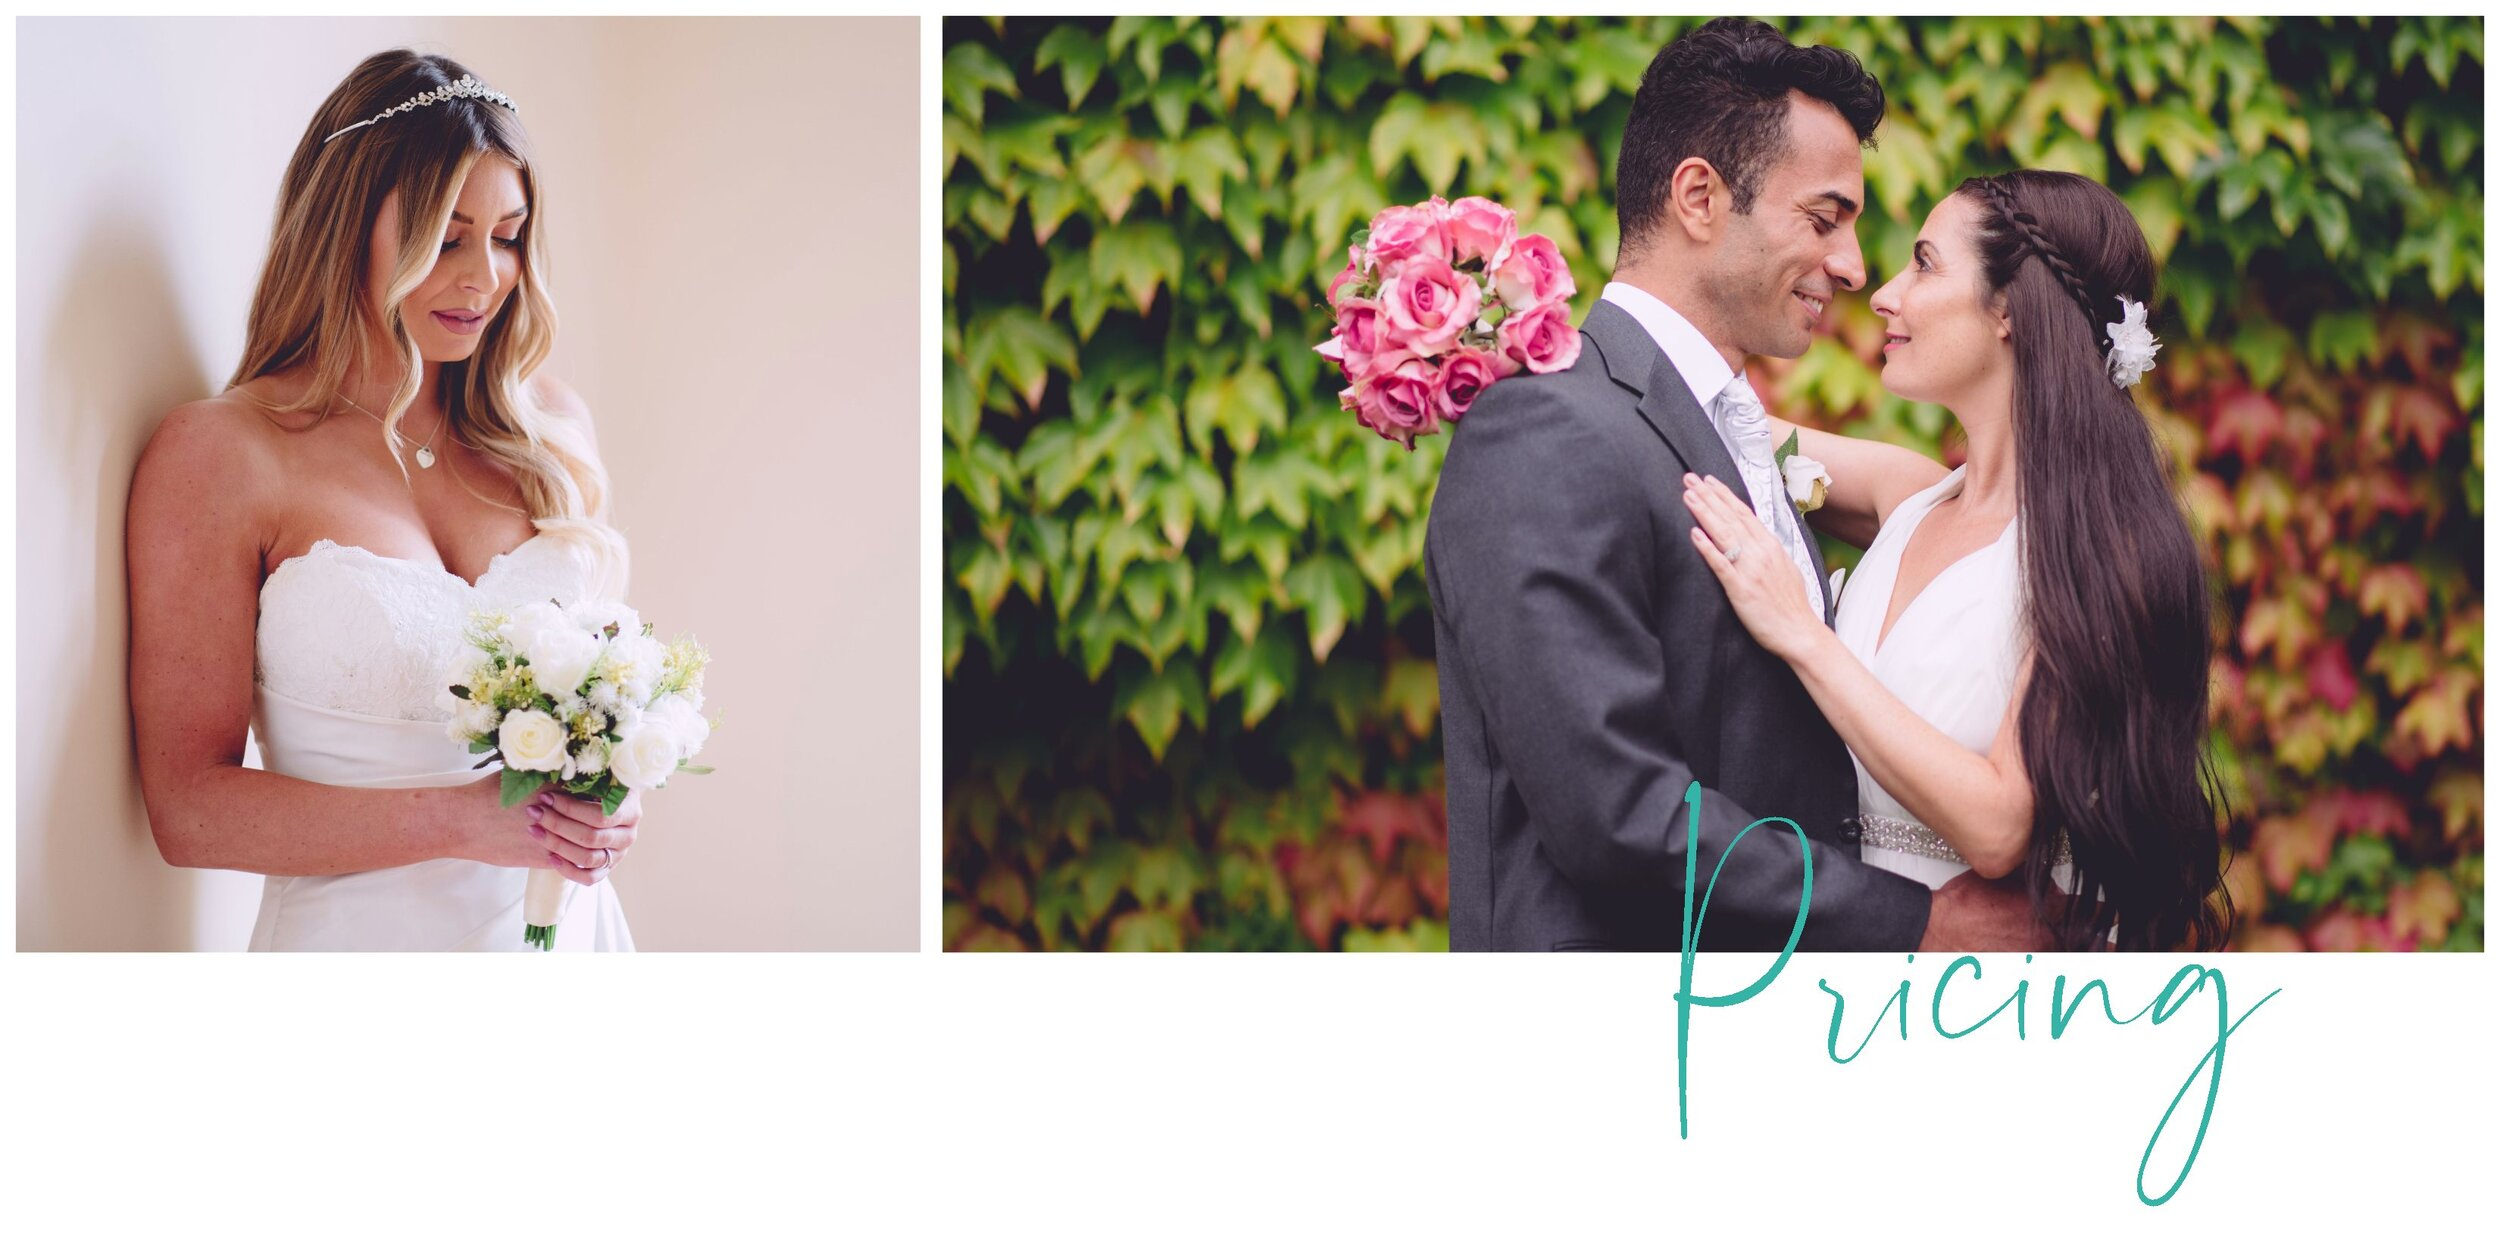 Thomas Lowe Wedding Photography Pricing